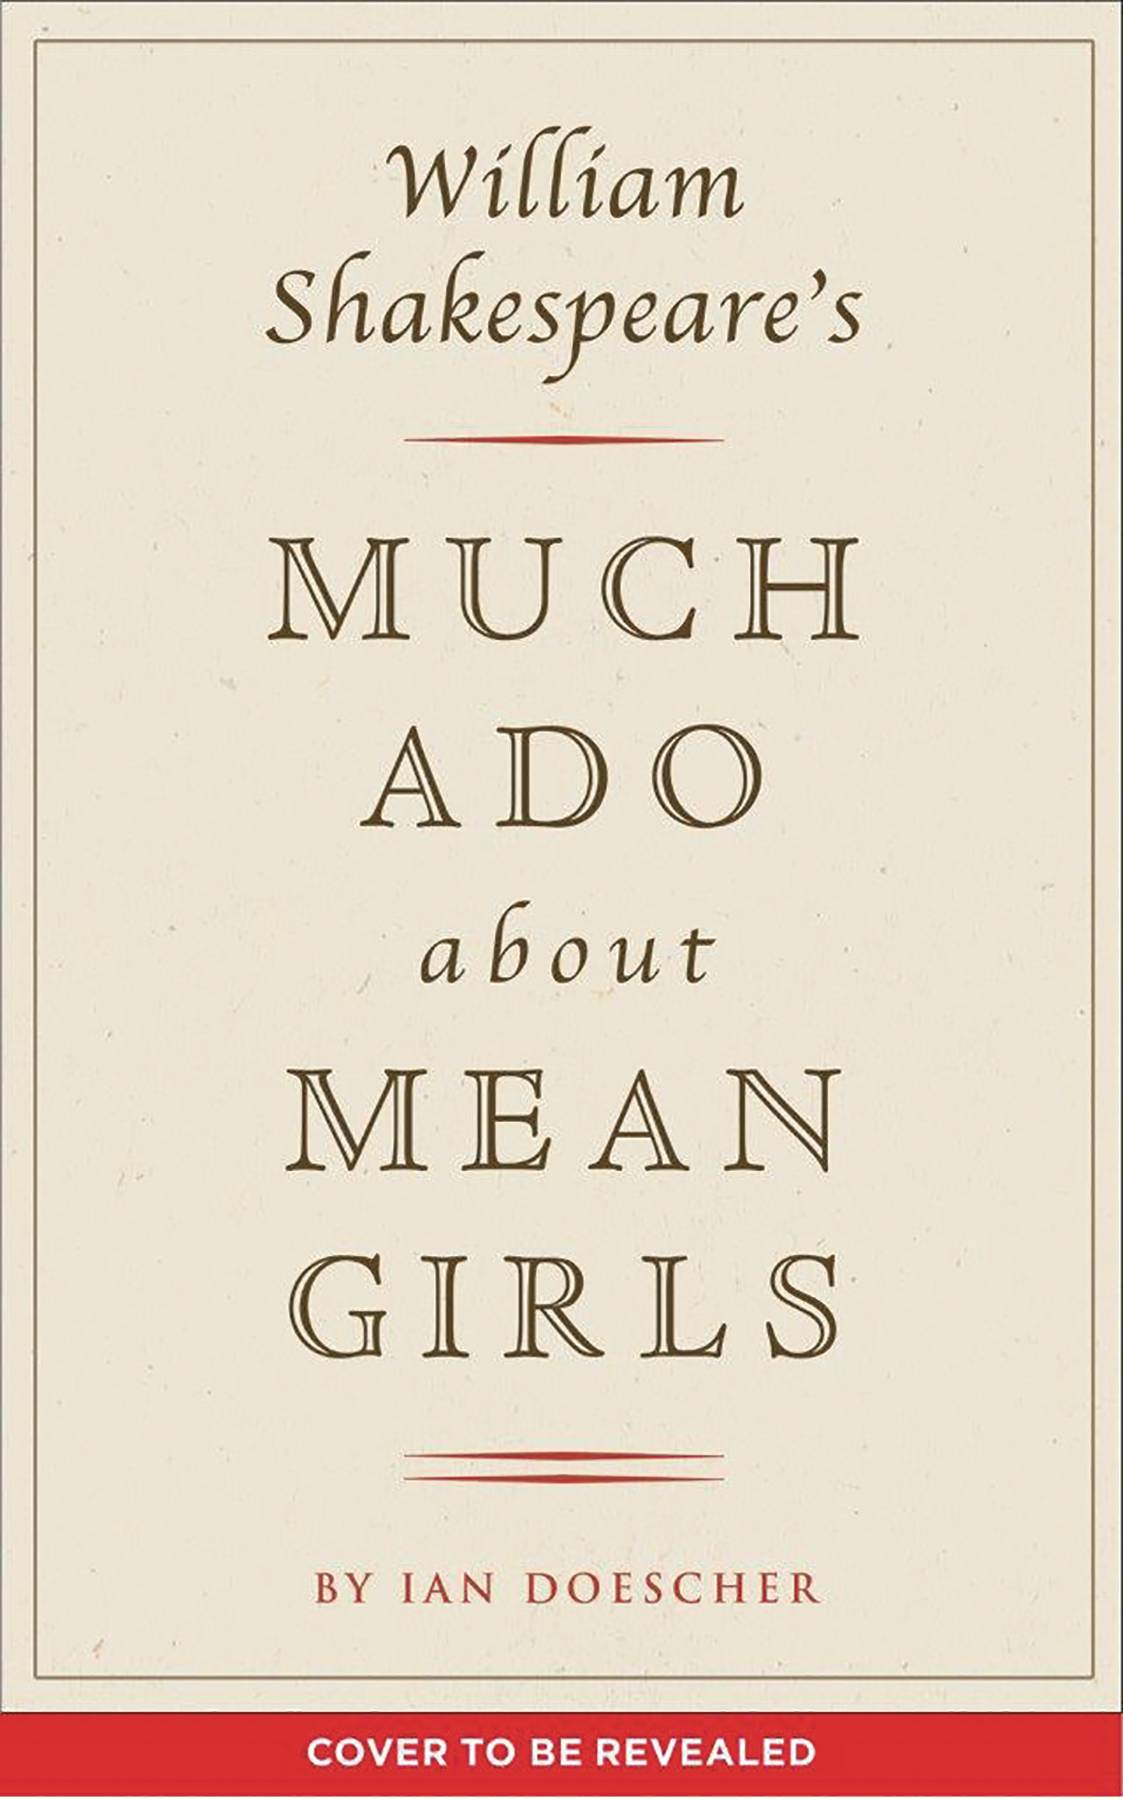 WILLIAM SHAKESPEARE MUCH ADO ABOUT MEAN GIRLS